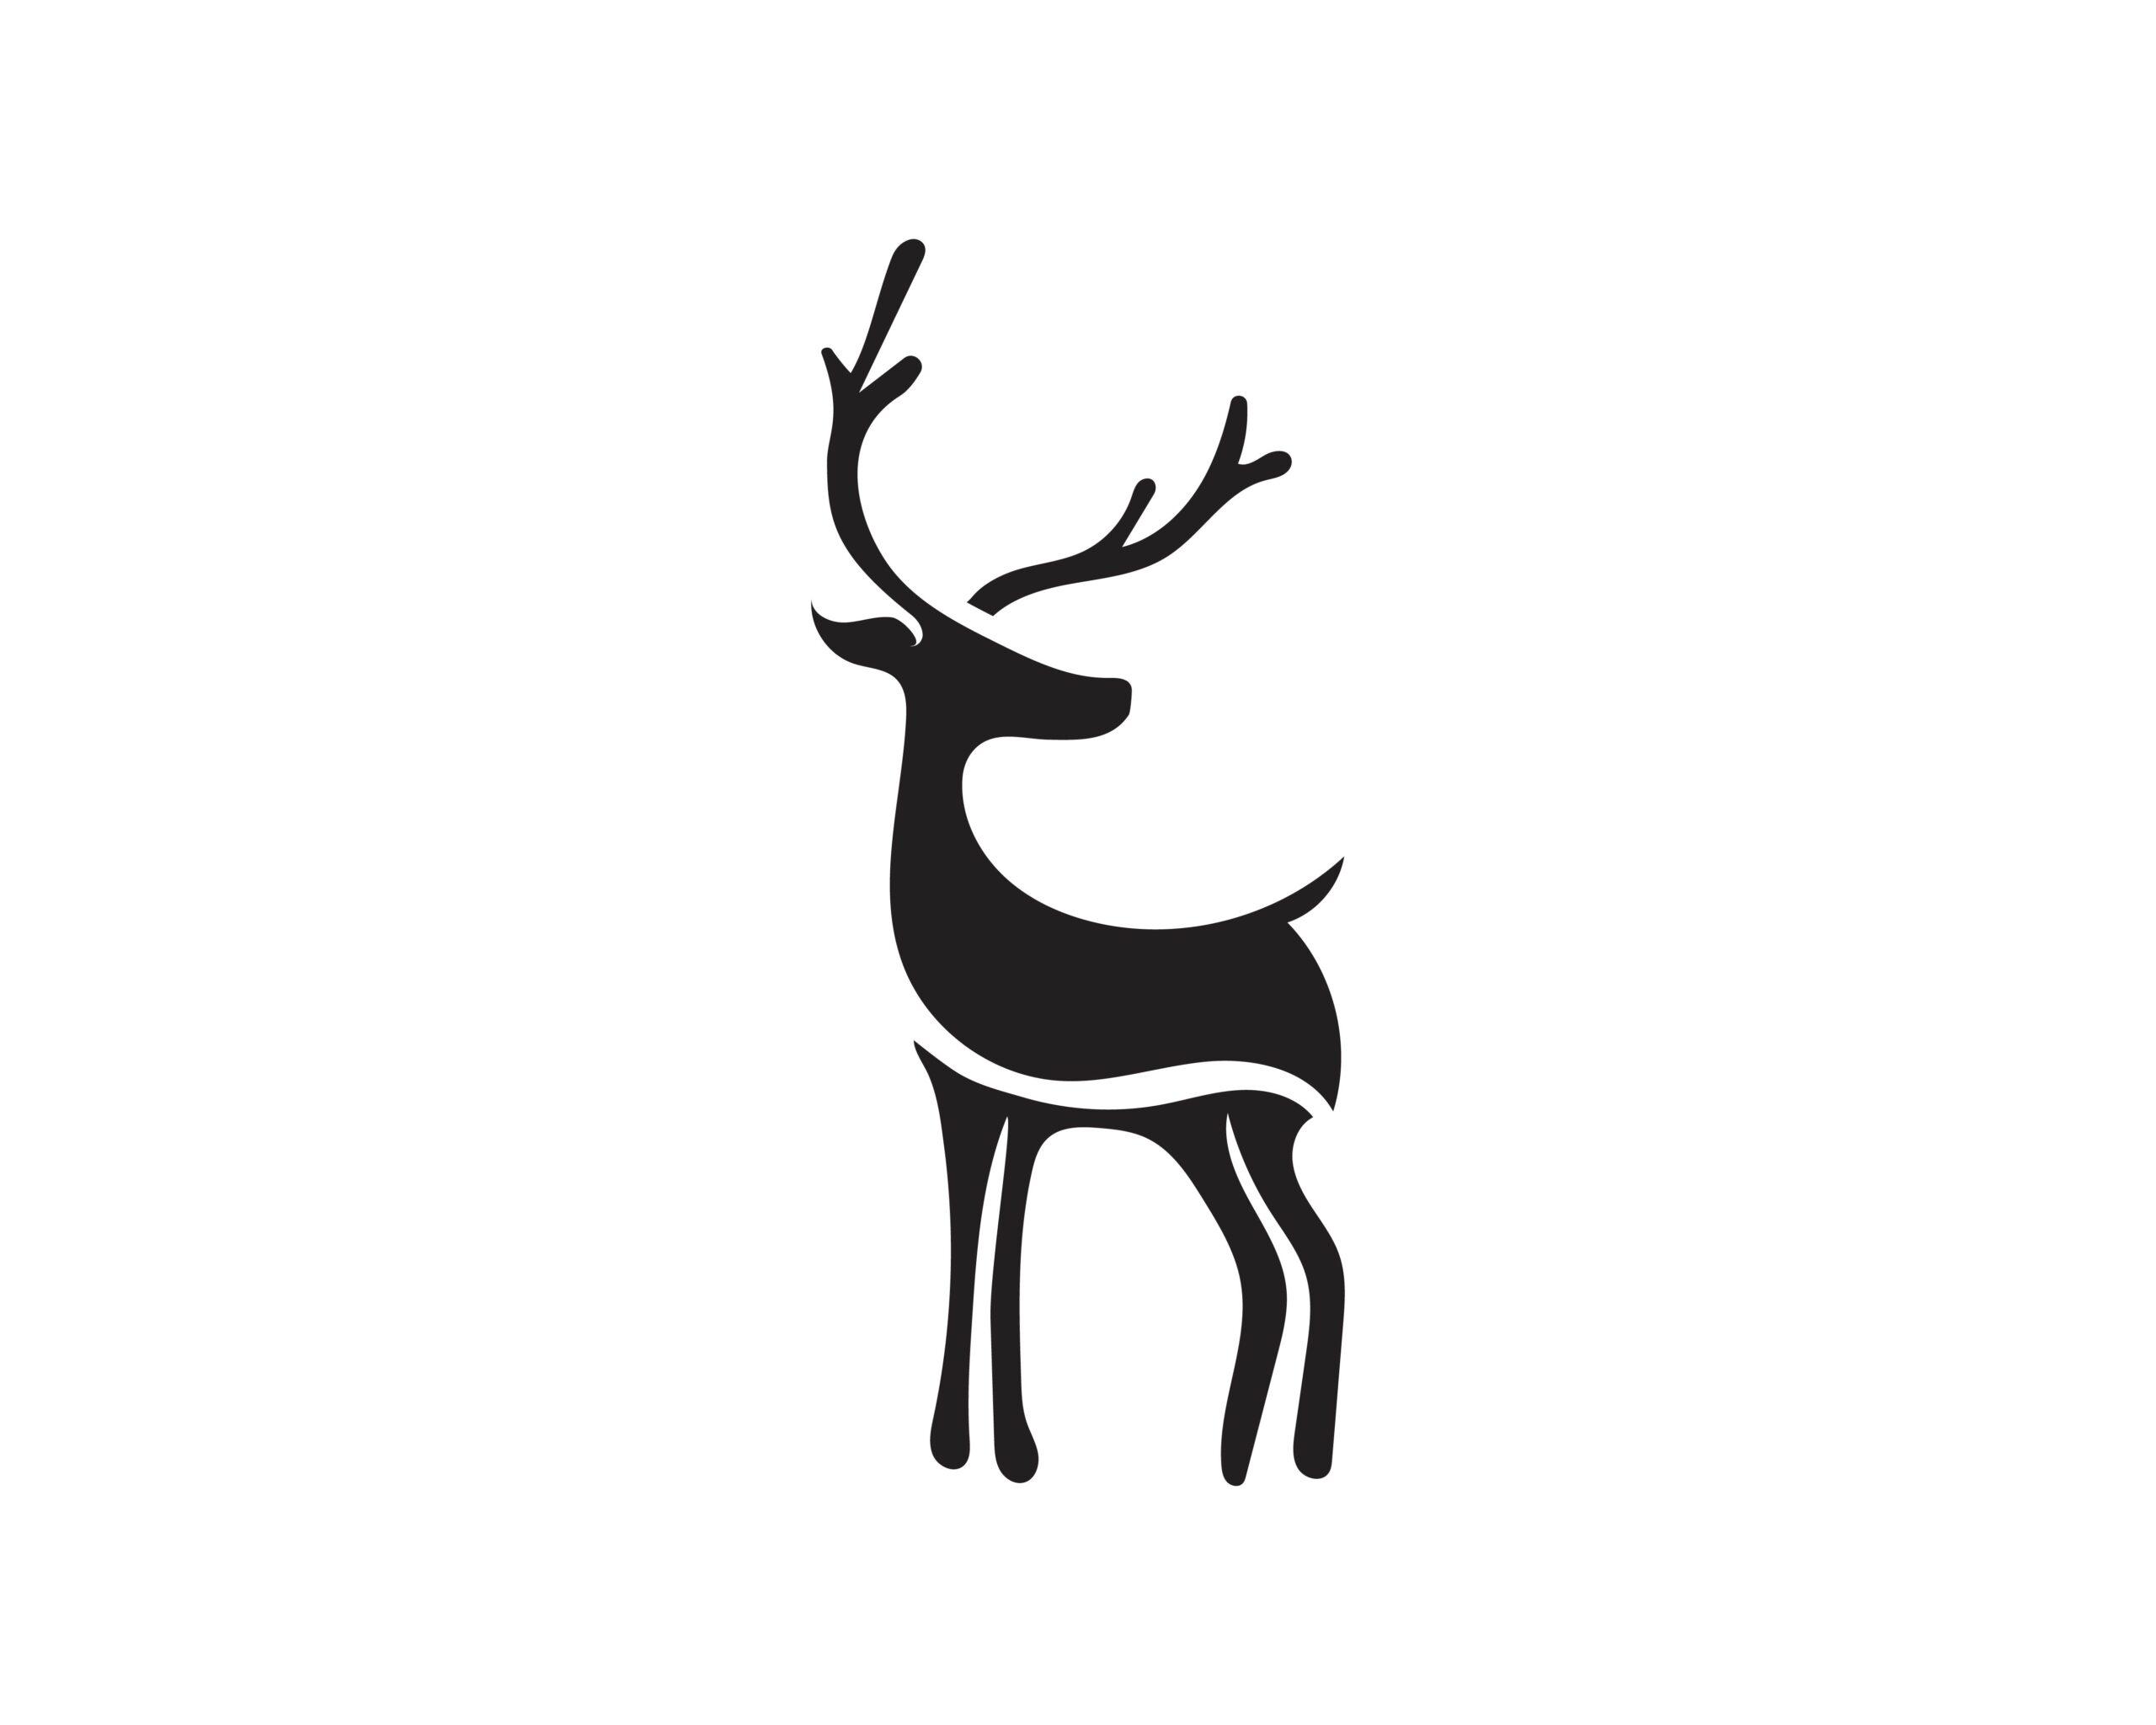 Naklejka na ścianę samica jelenia